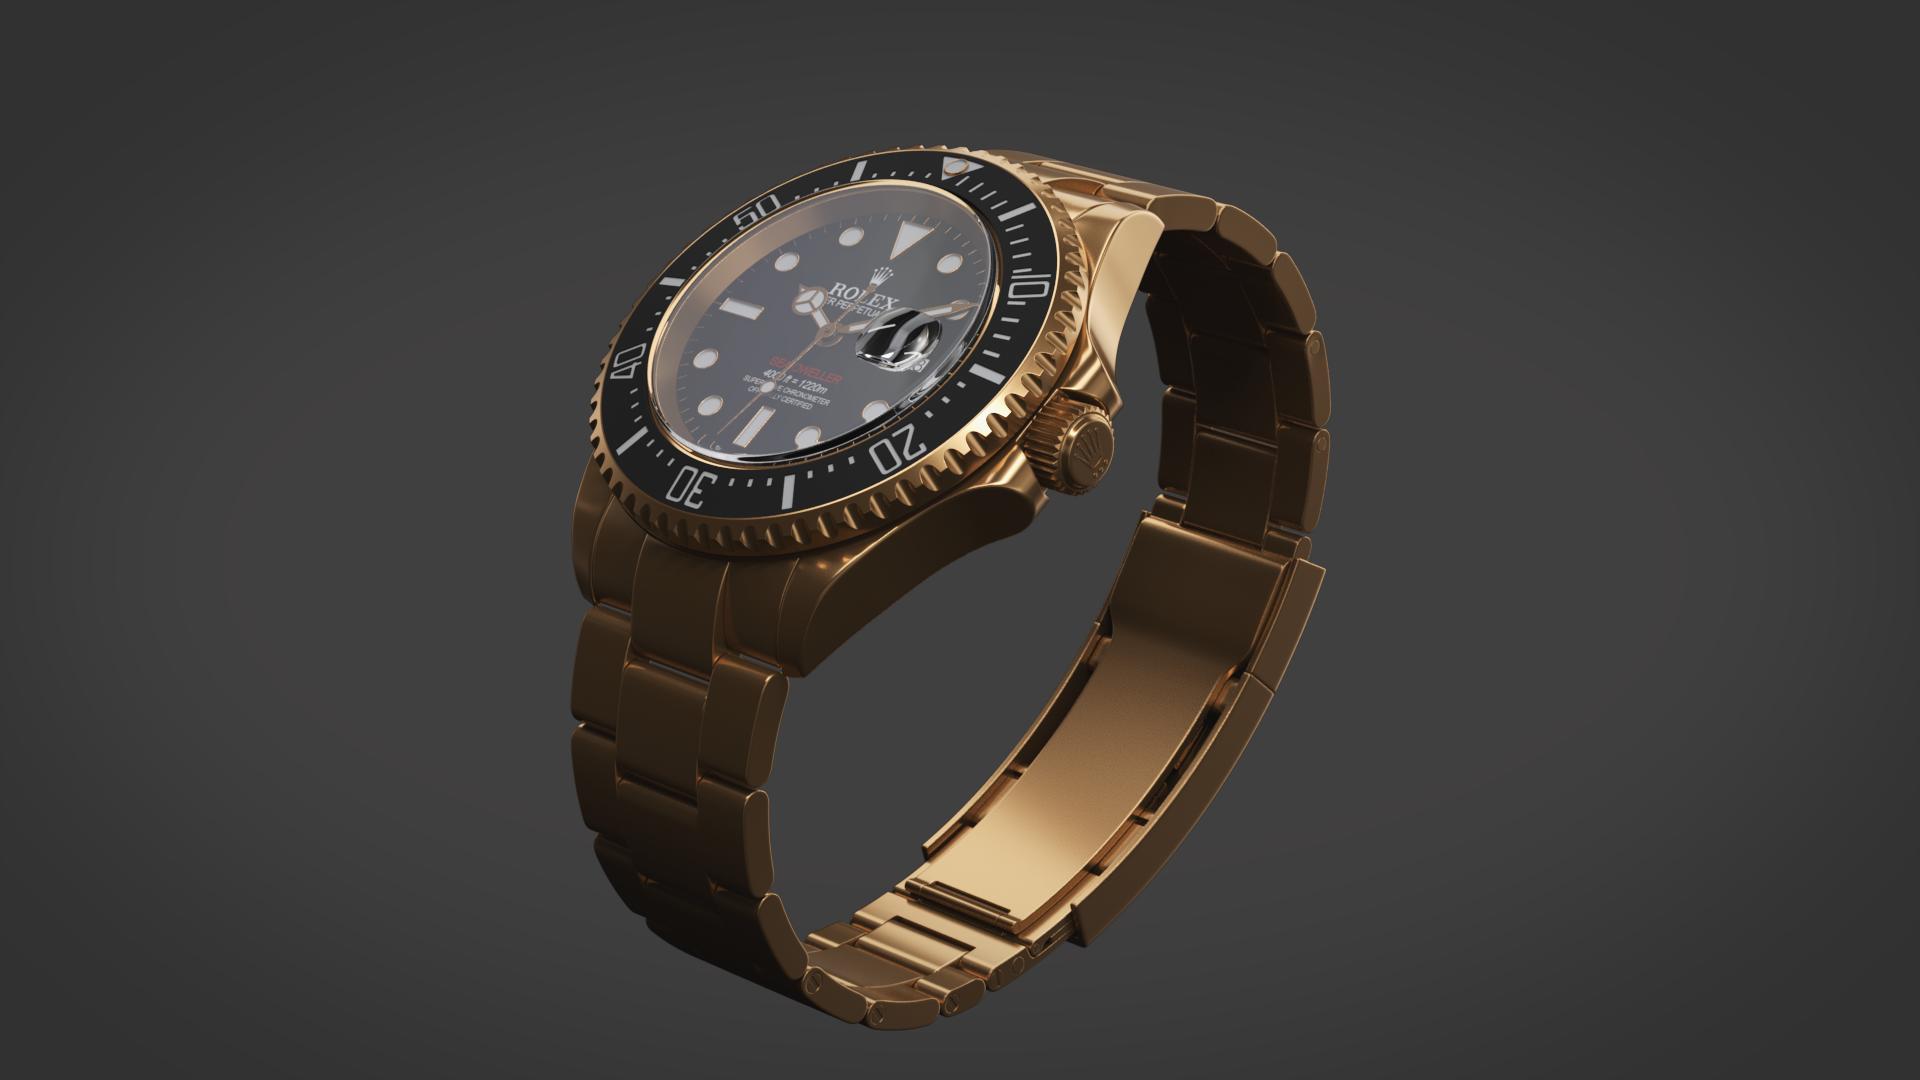 Rolex_Sea_Dweller_03-squashed.png